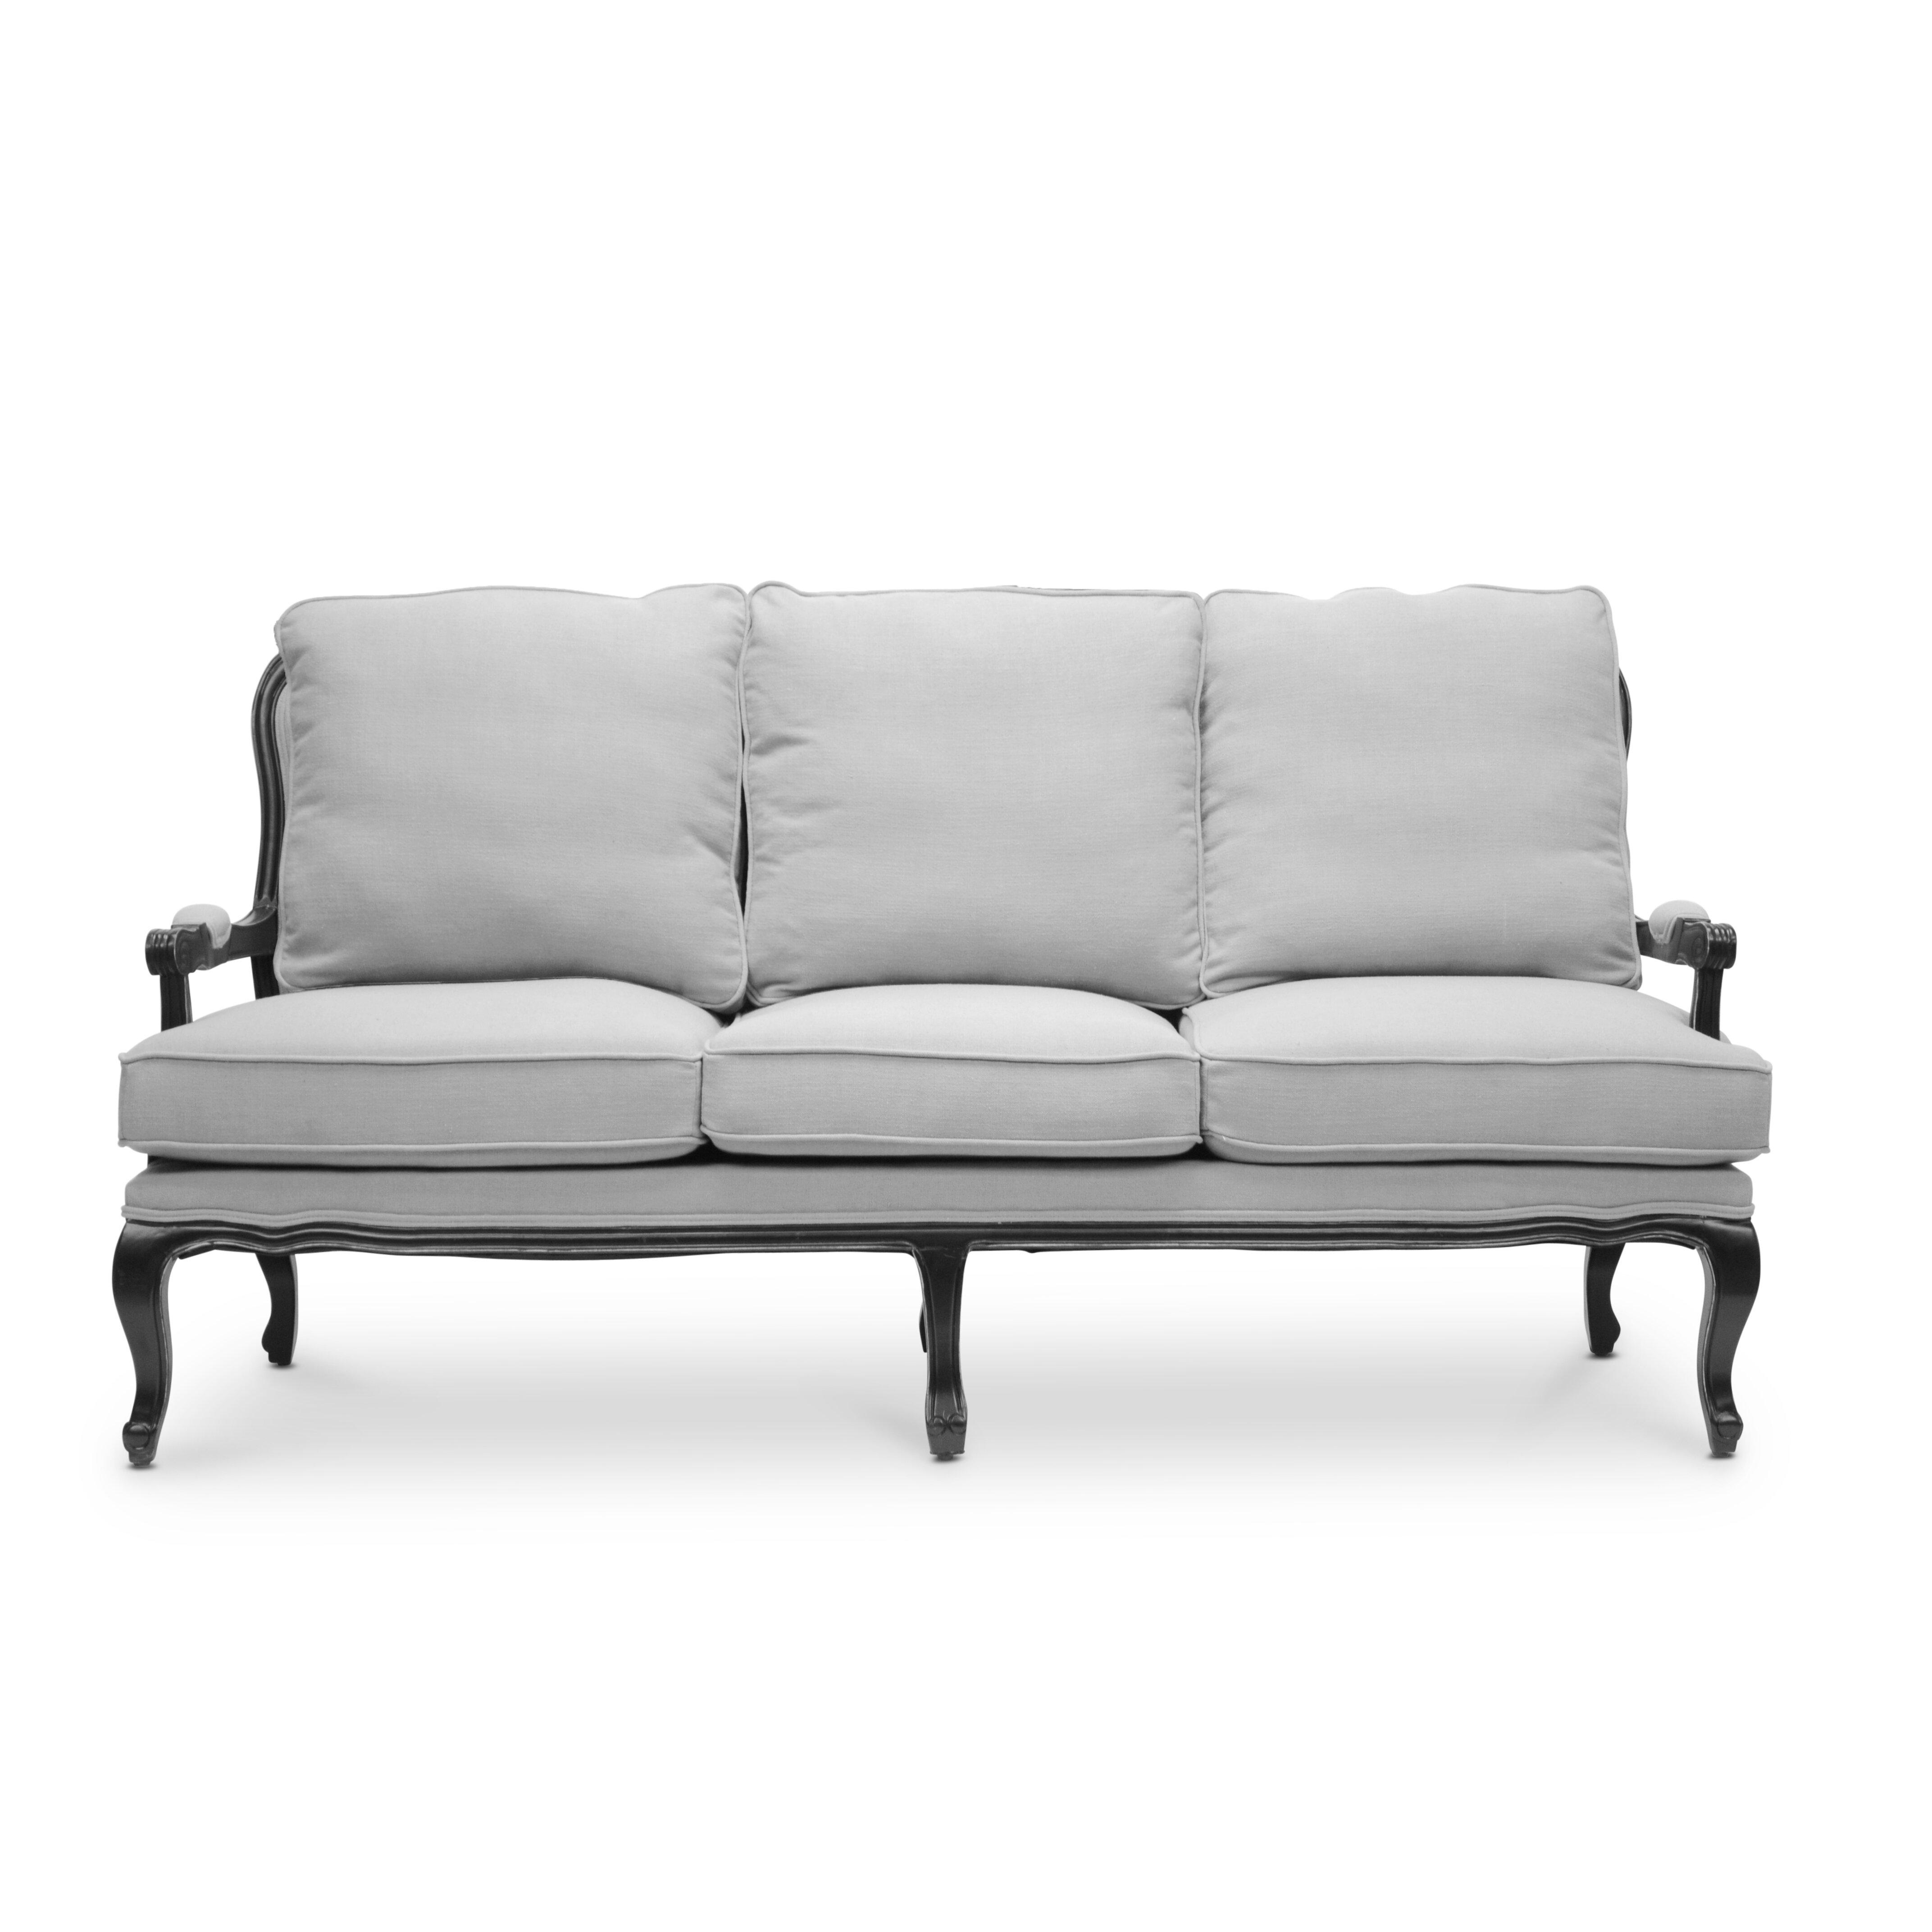 French Tufted Sofa hmmi